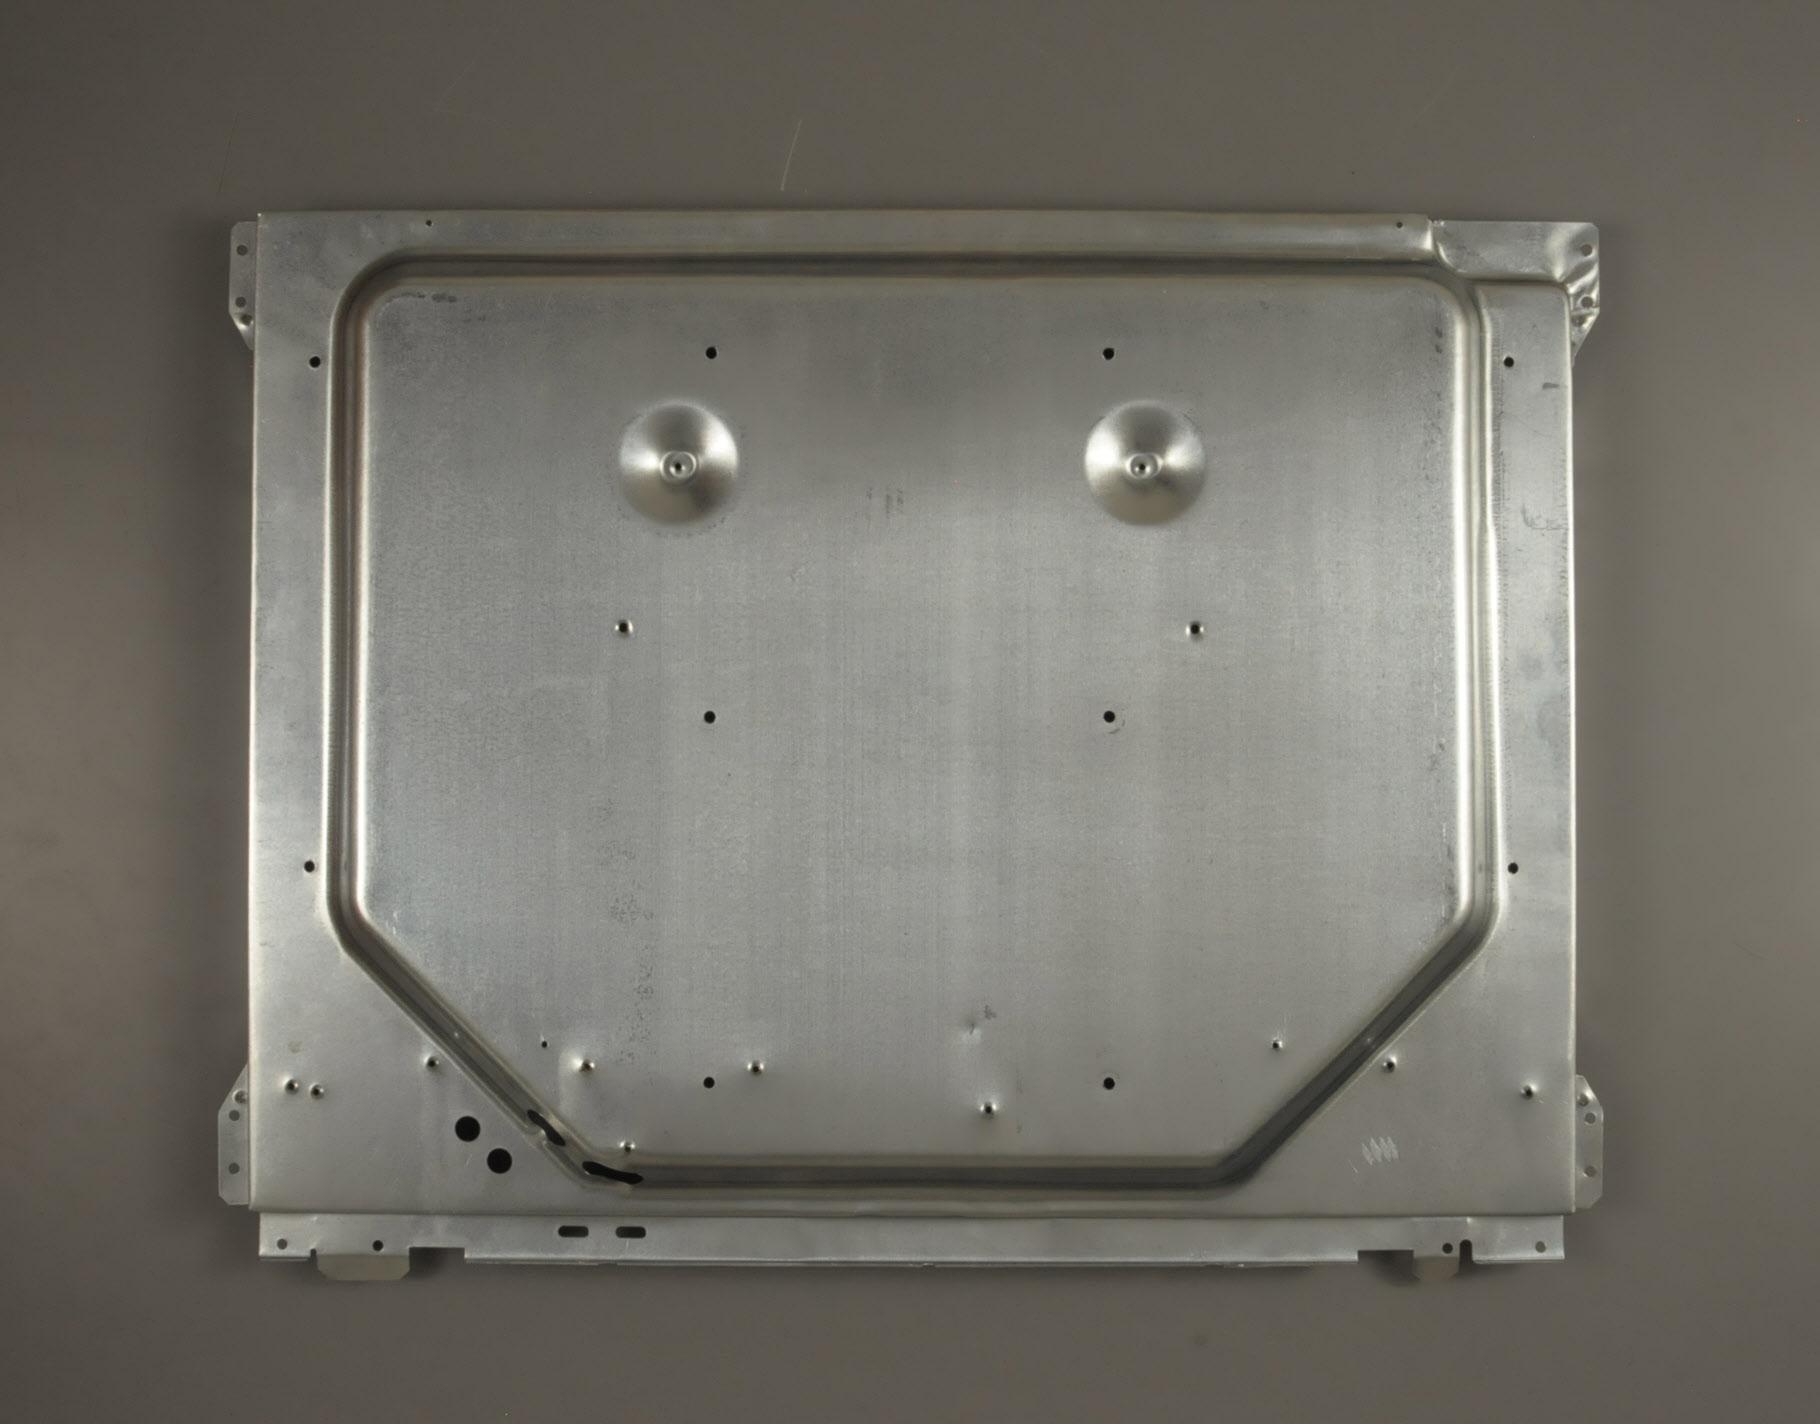 Samsung Range/Stove/Oven Part # 3804F231-51 - Base Panel